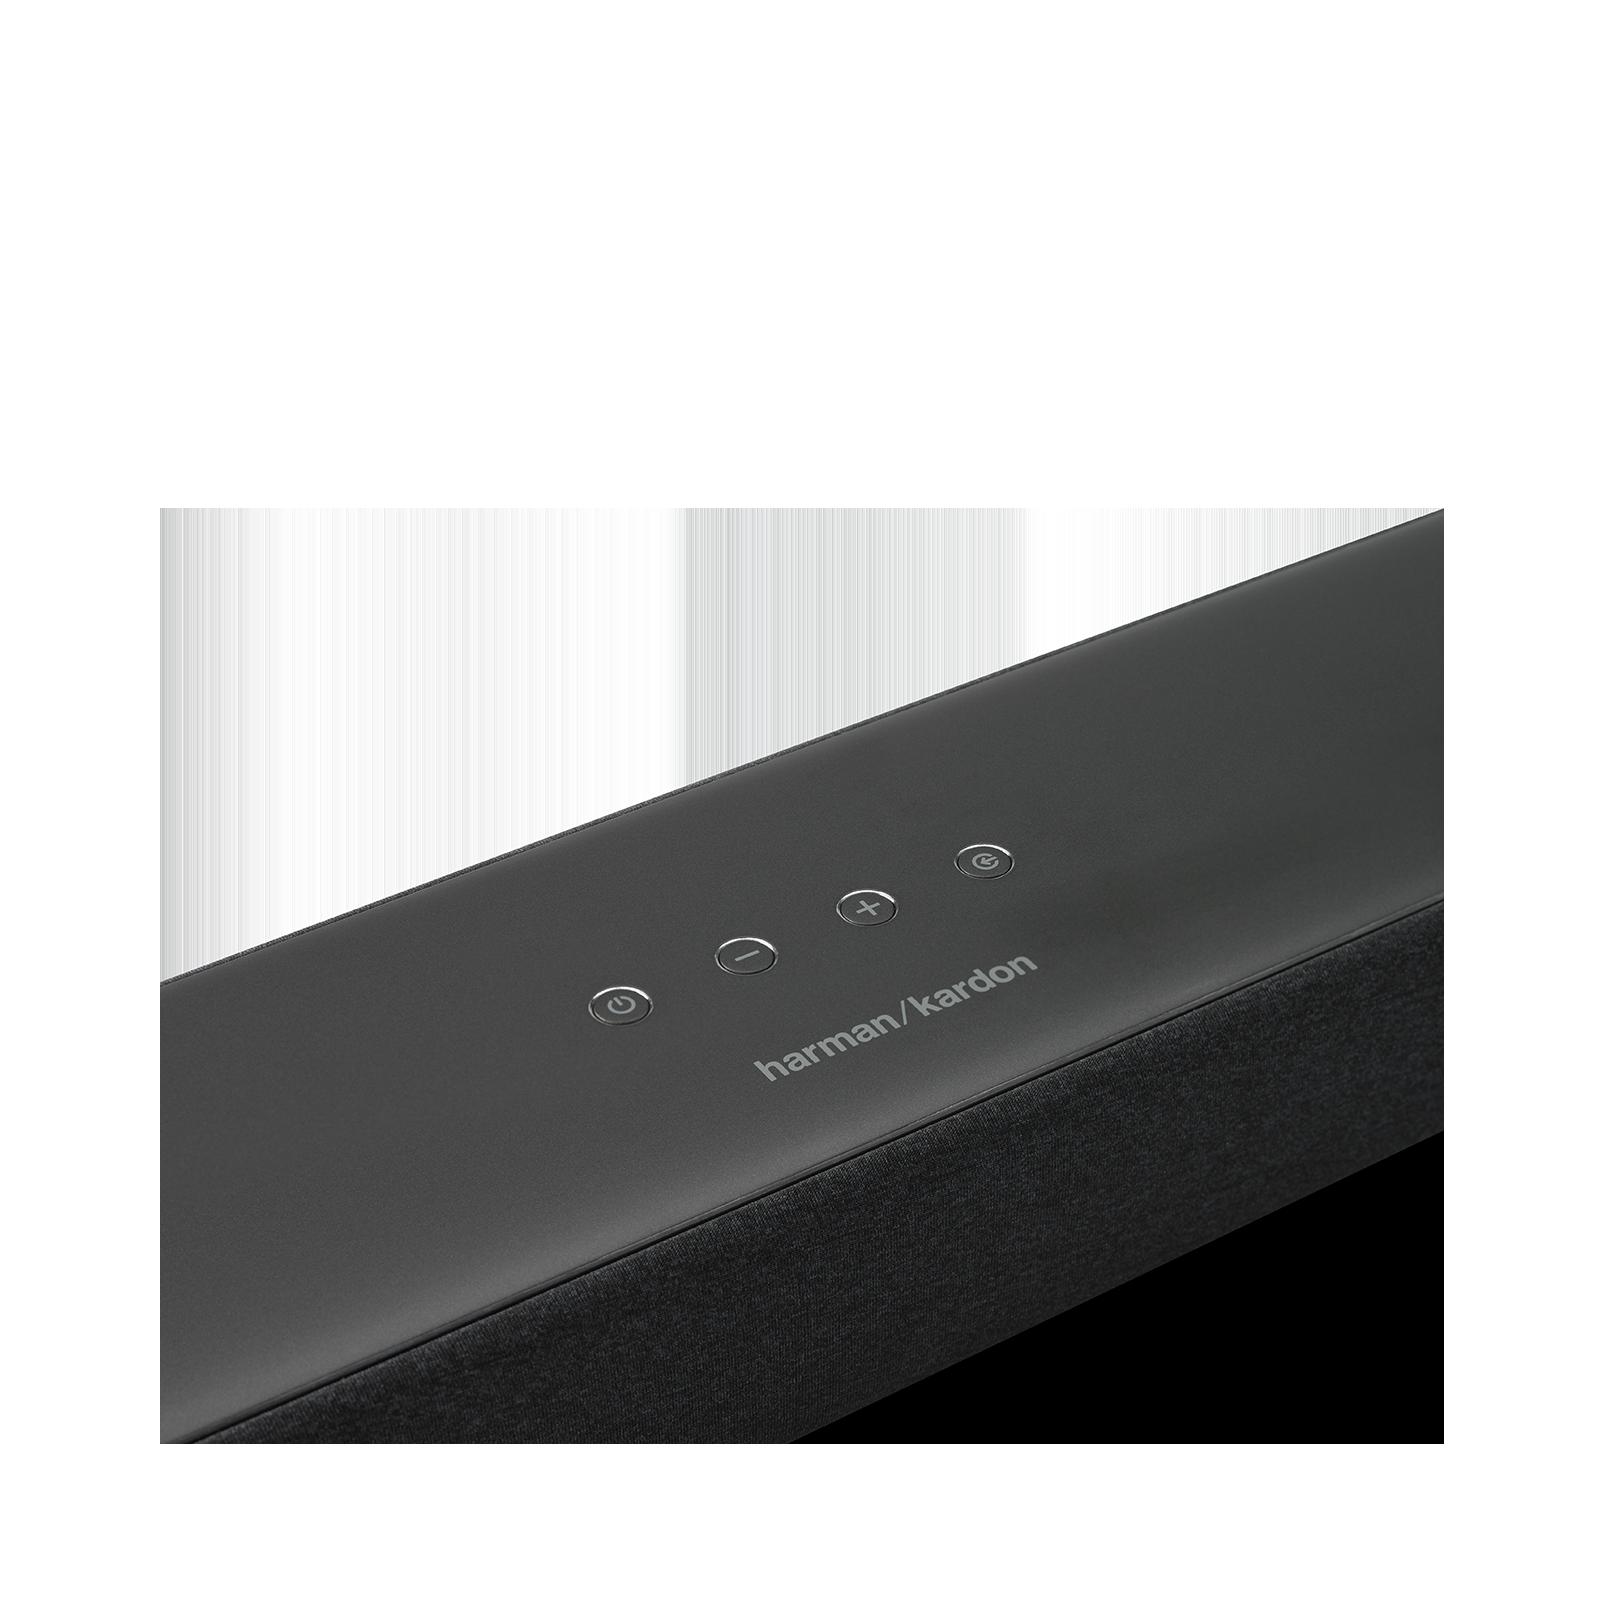 Enchant 1300 - Graphite - All in One 13-Channel Soundbar with MultiBeam™ Surround Sound - Detailshot 2